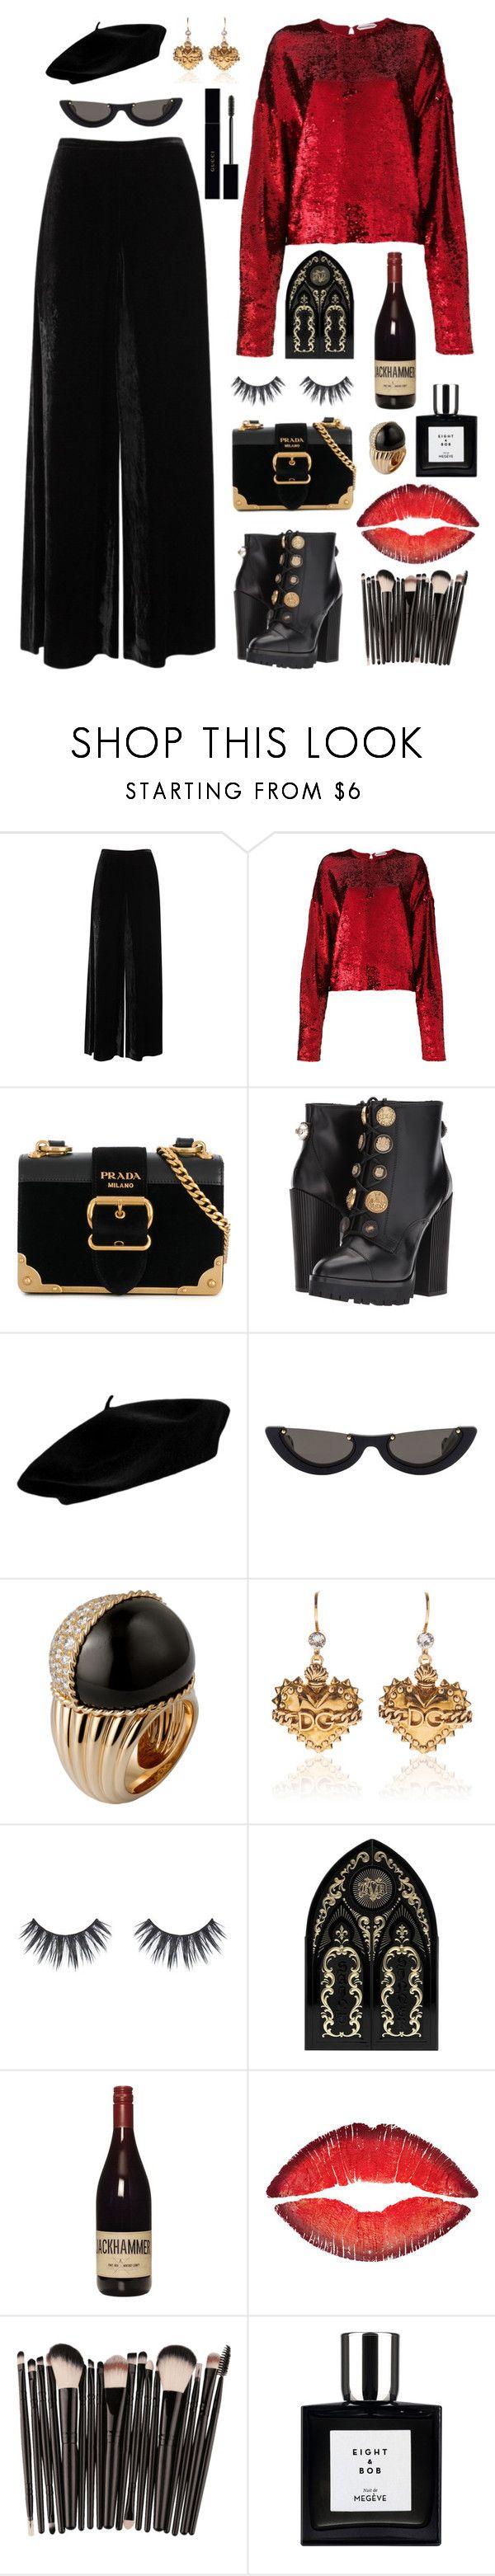 """mon chéri"" by ytopia on Polyvore featuring мода, M Missoni, Giacobino, Prada, Dolce&Gabbana, PAWAKA, Kat Von D, Givenchy и Gucci"